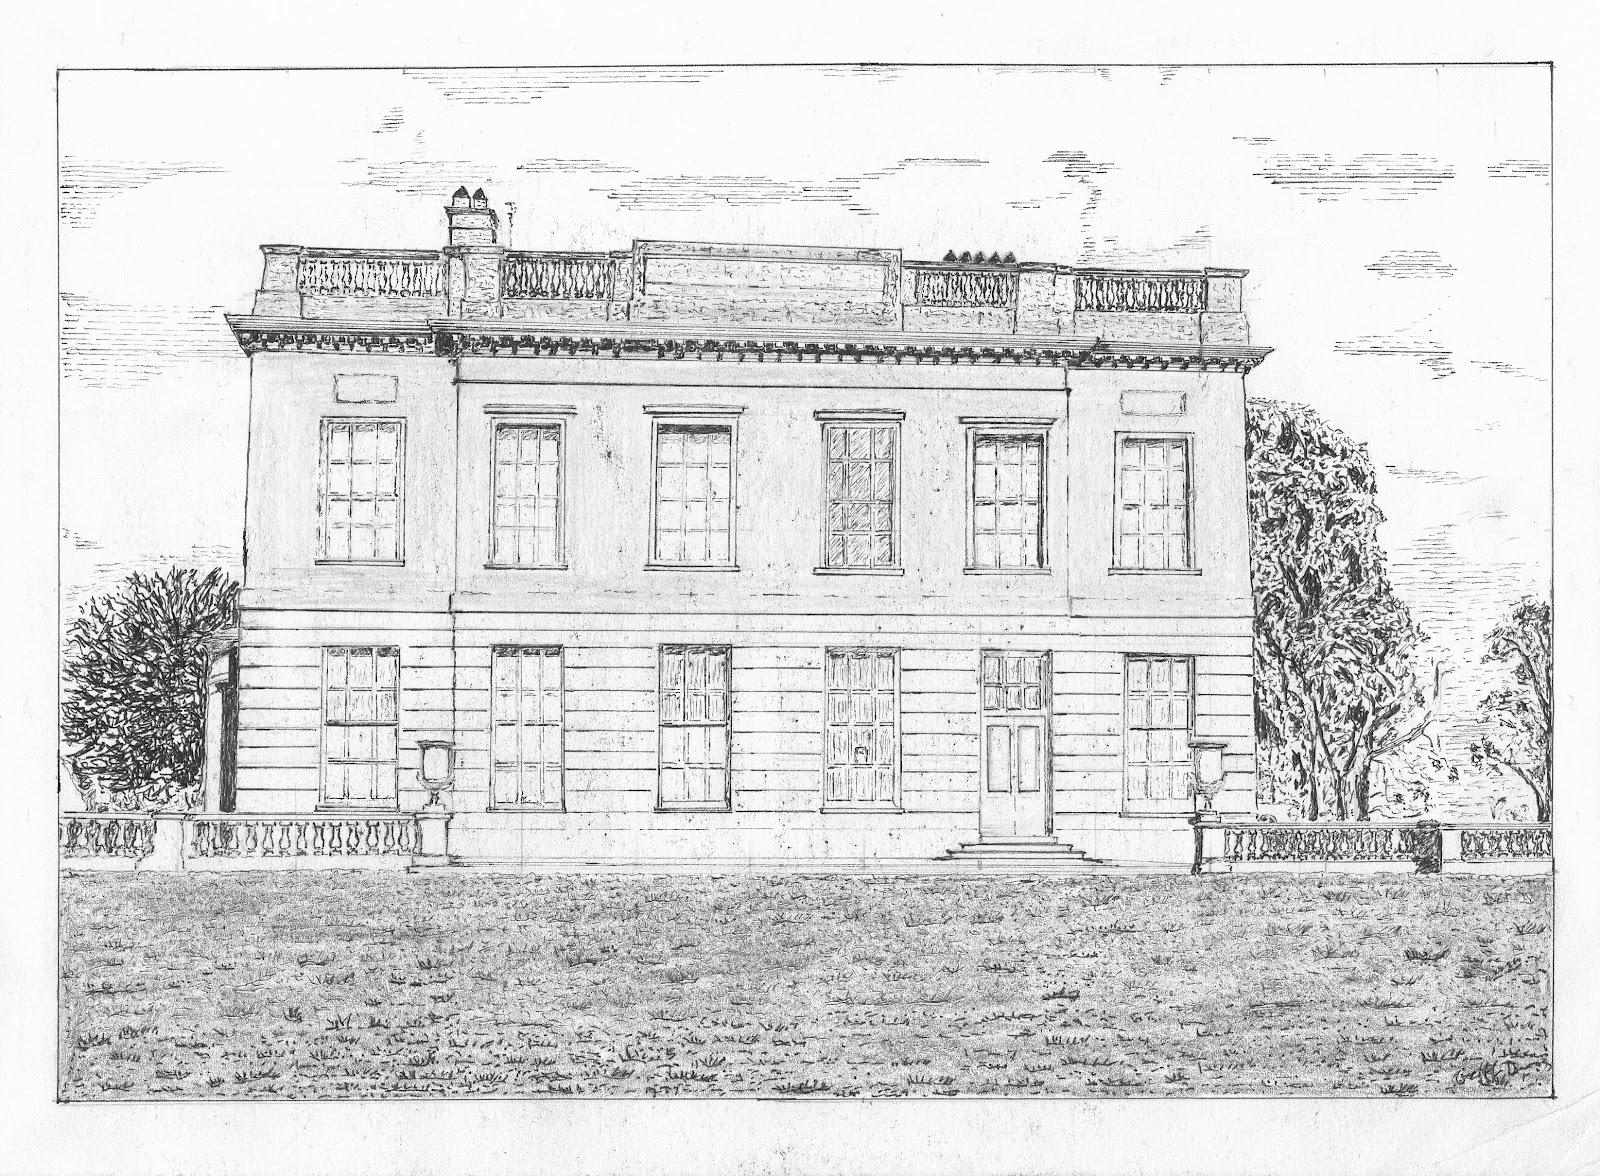 Hamlet Castle Drawing Below a Line Drawing of